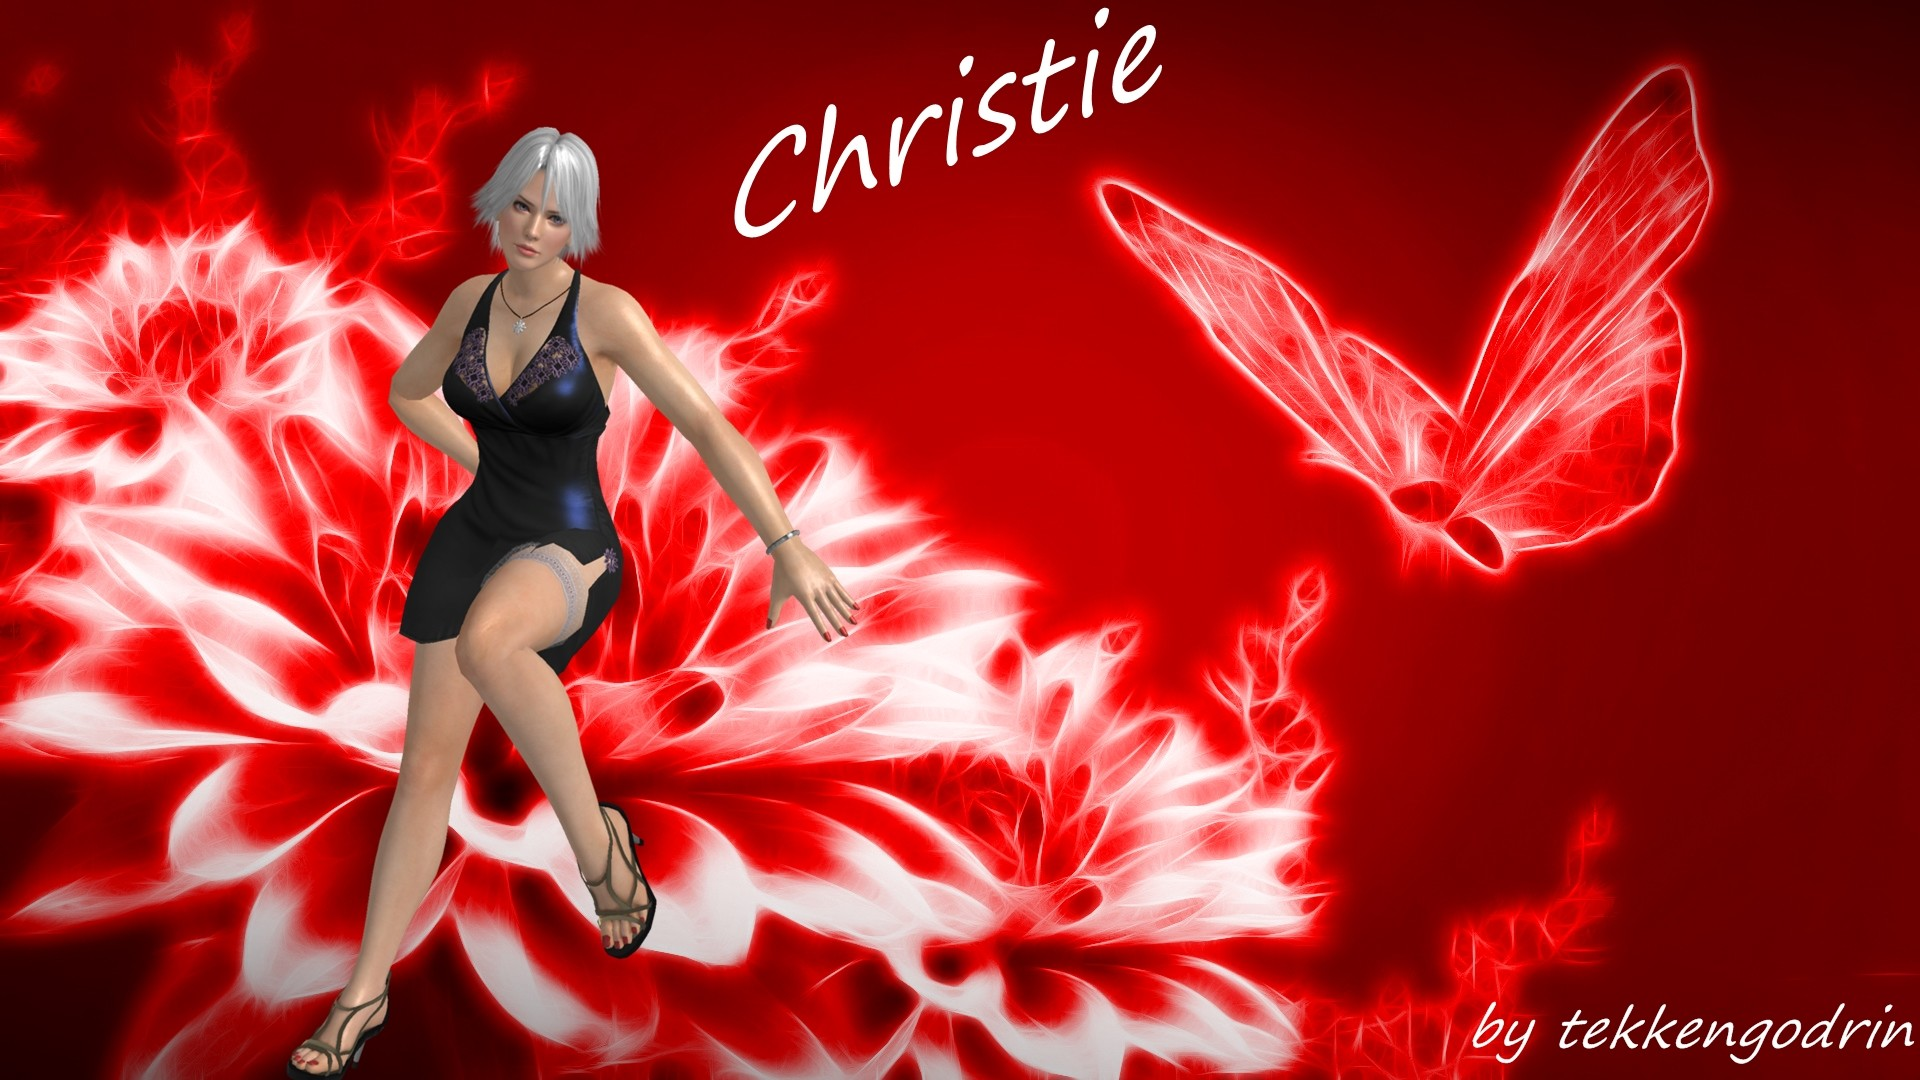 … Dead Or Alive 5 Christie Wallpaper by TekkenGodRin